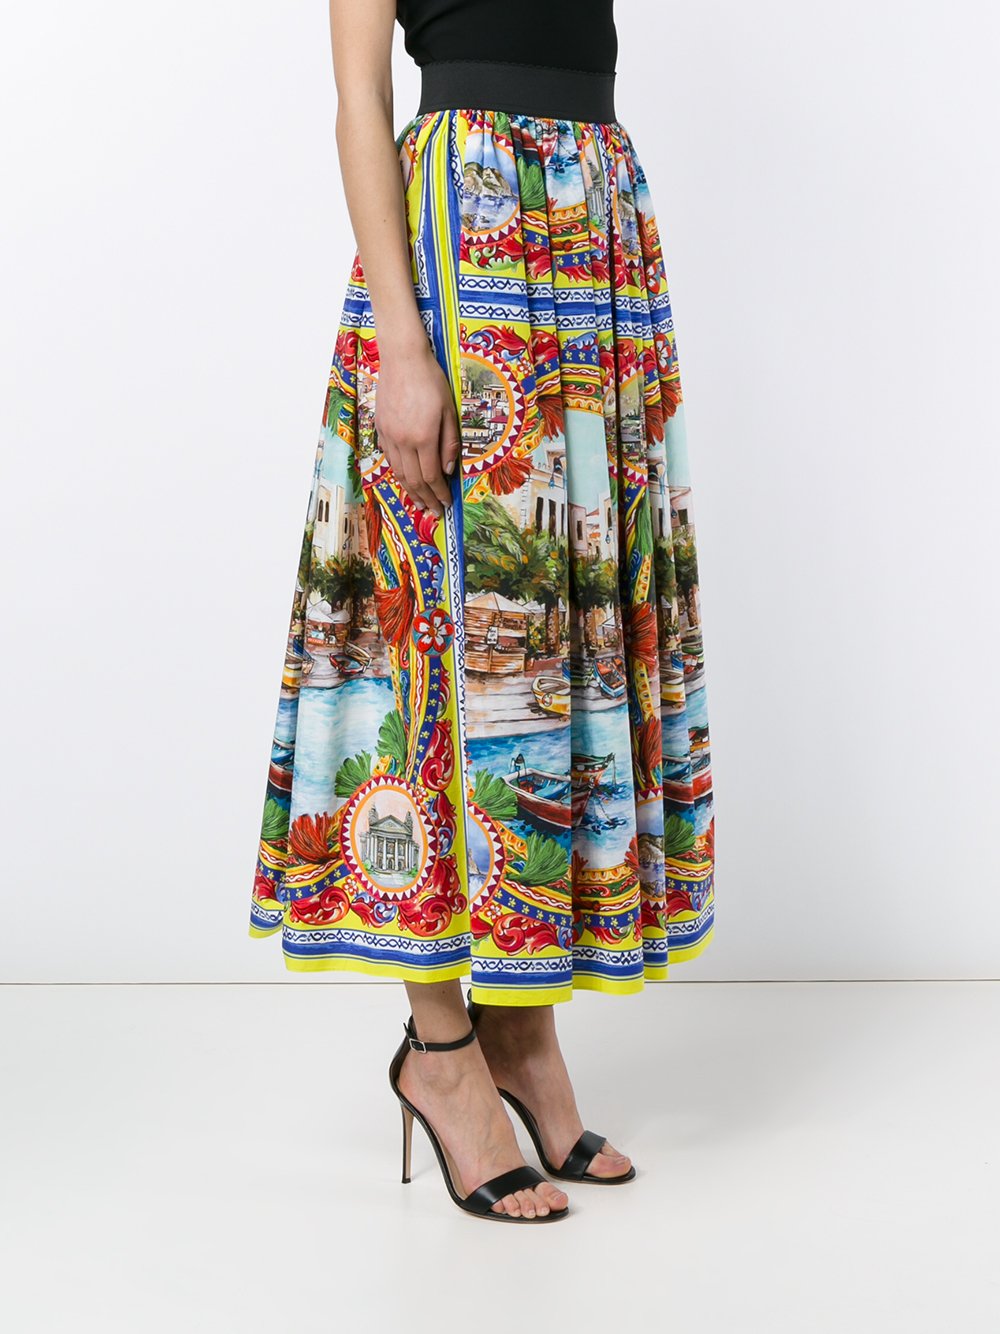 Dolceamp; Maxi Skirt Gabbana Lyst Printed Mondello 80OknwP